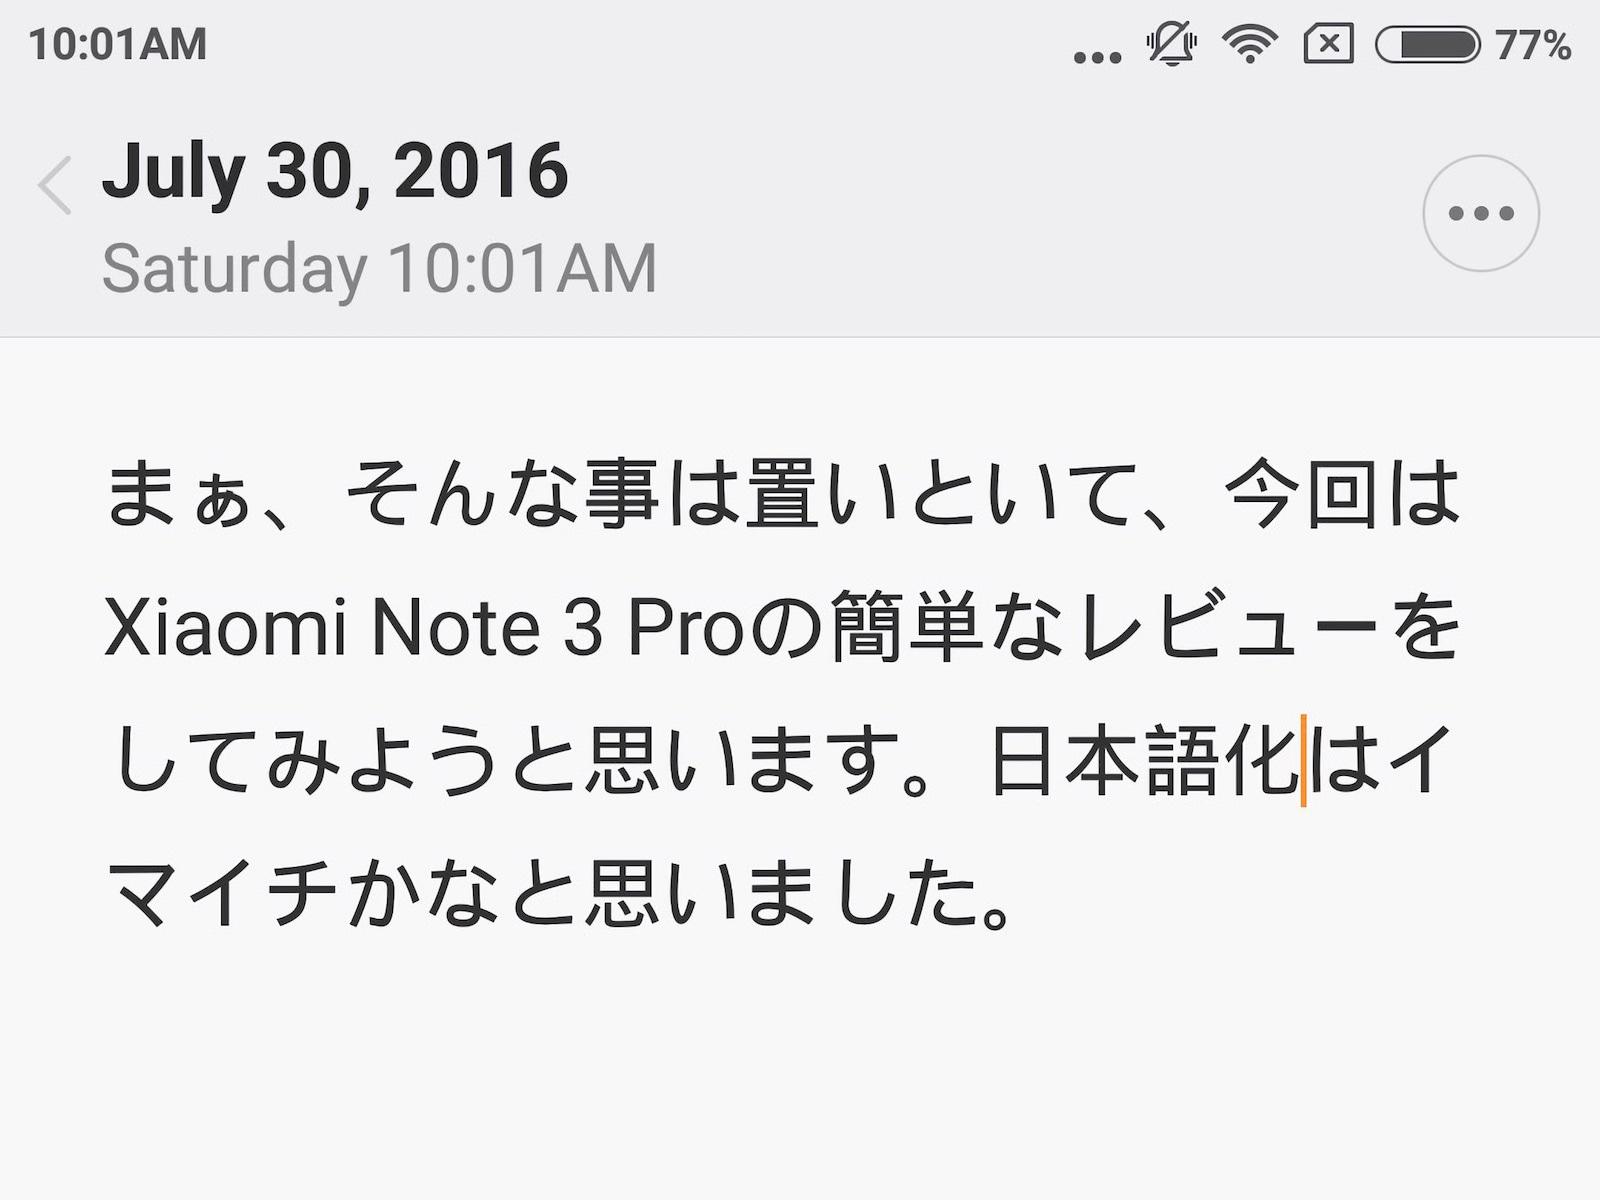 Xiaomi Redmi Note 3 Pro 日本語化